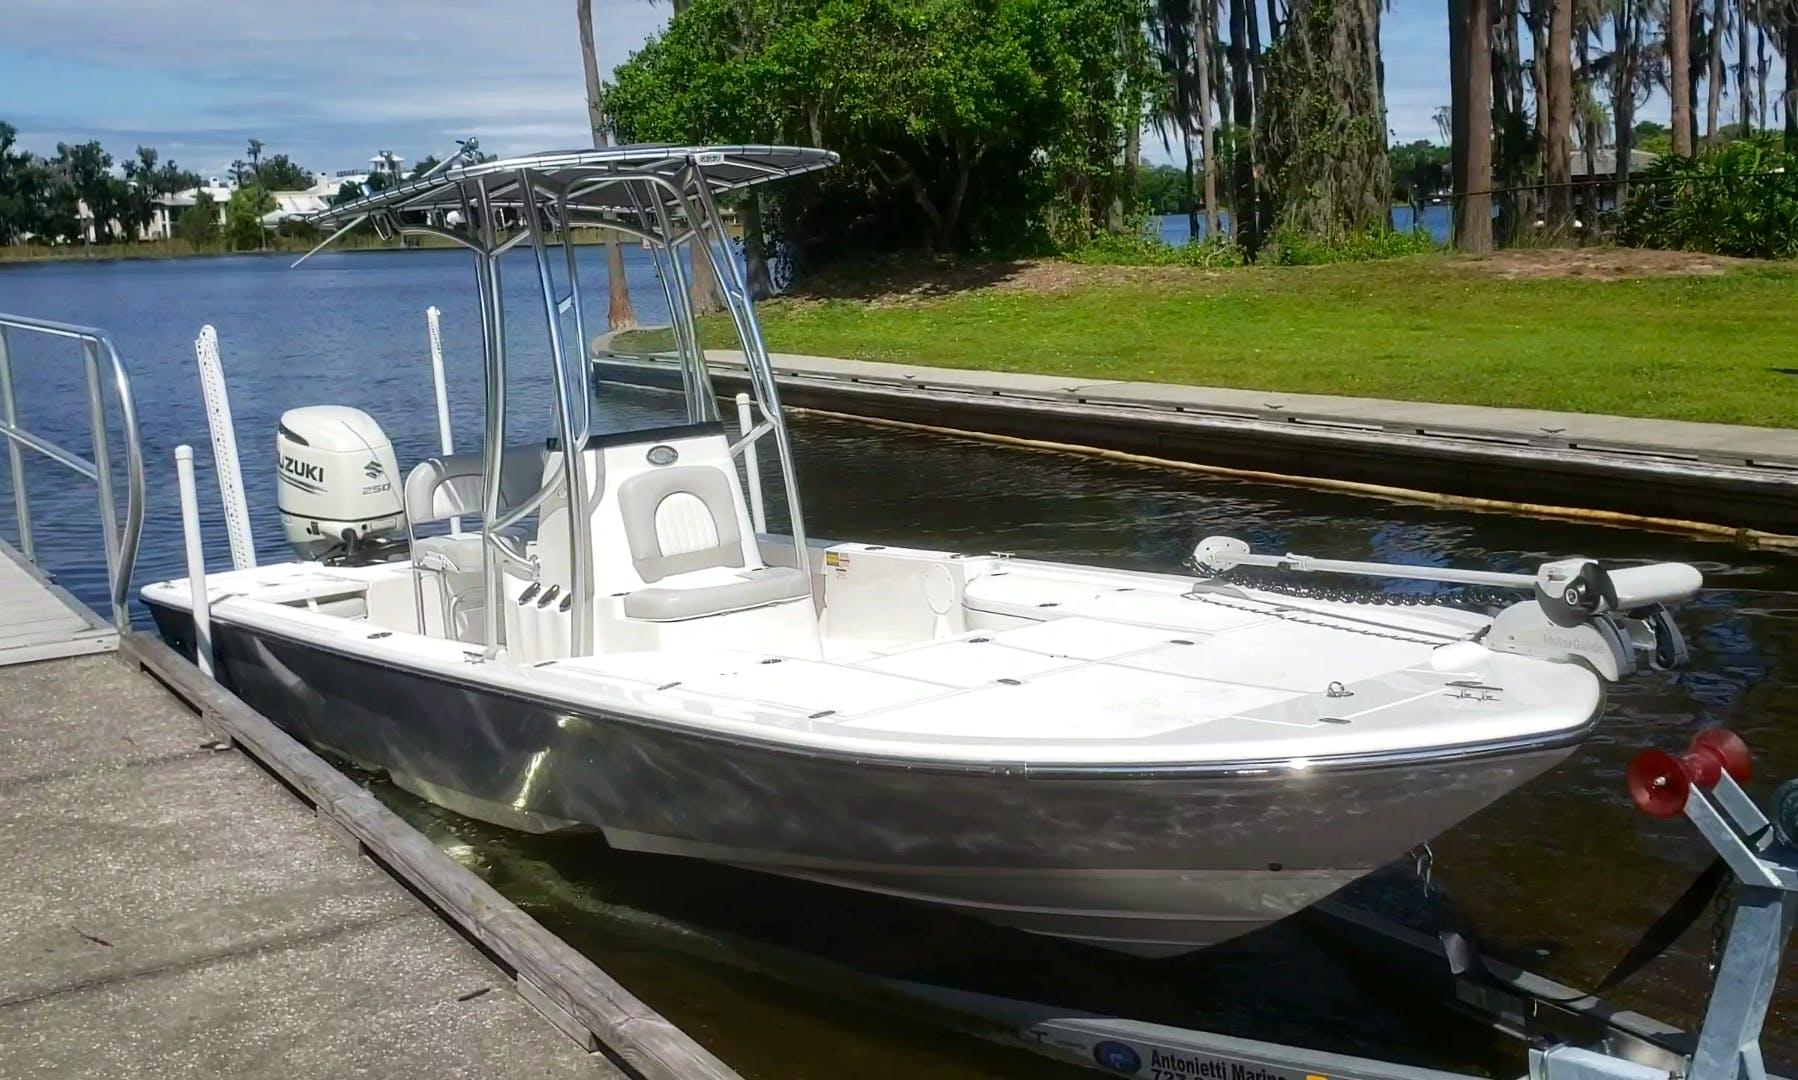 Sea Born FX24 Center Console Fishing Boat Rental in Windermere, Florida